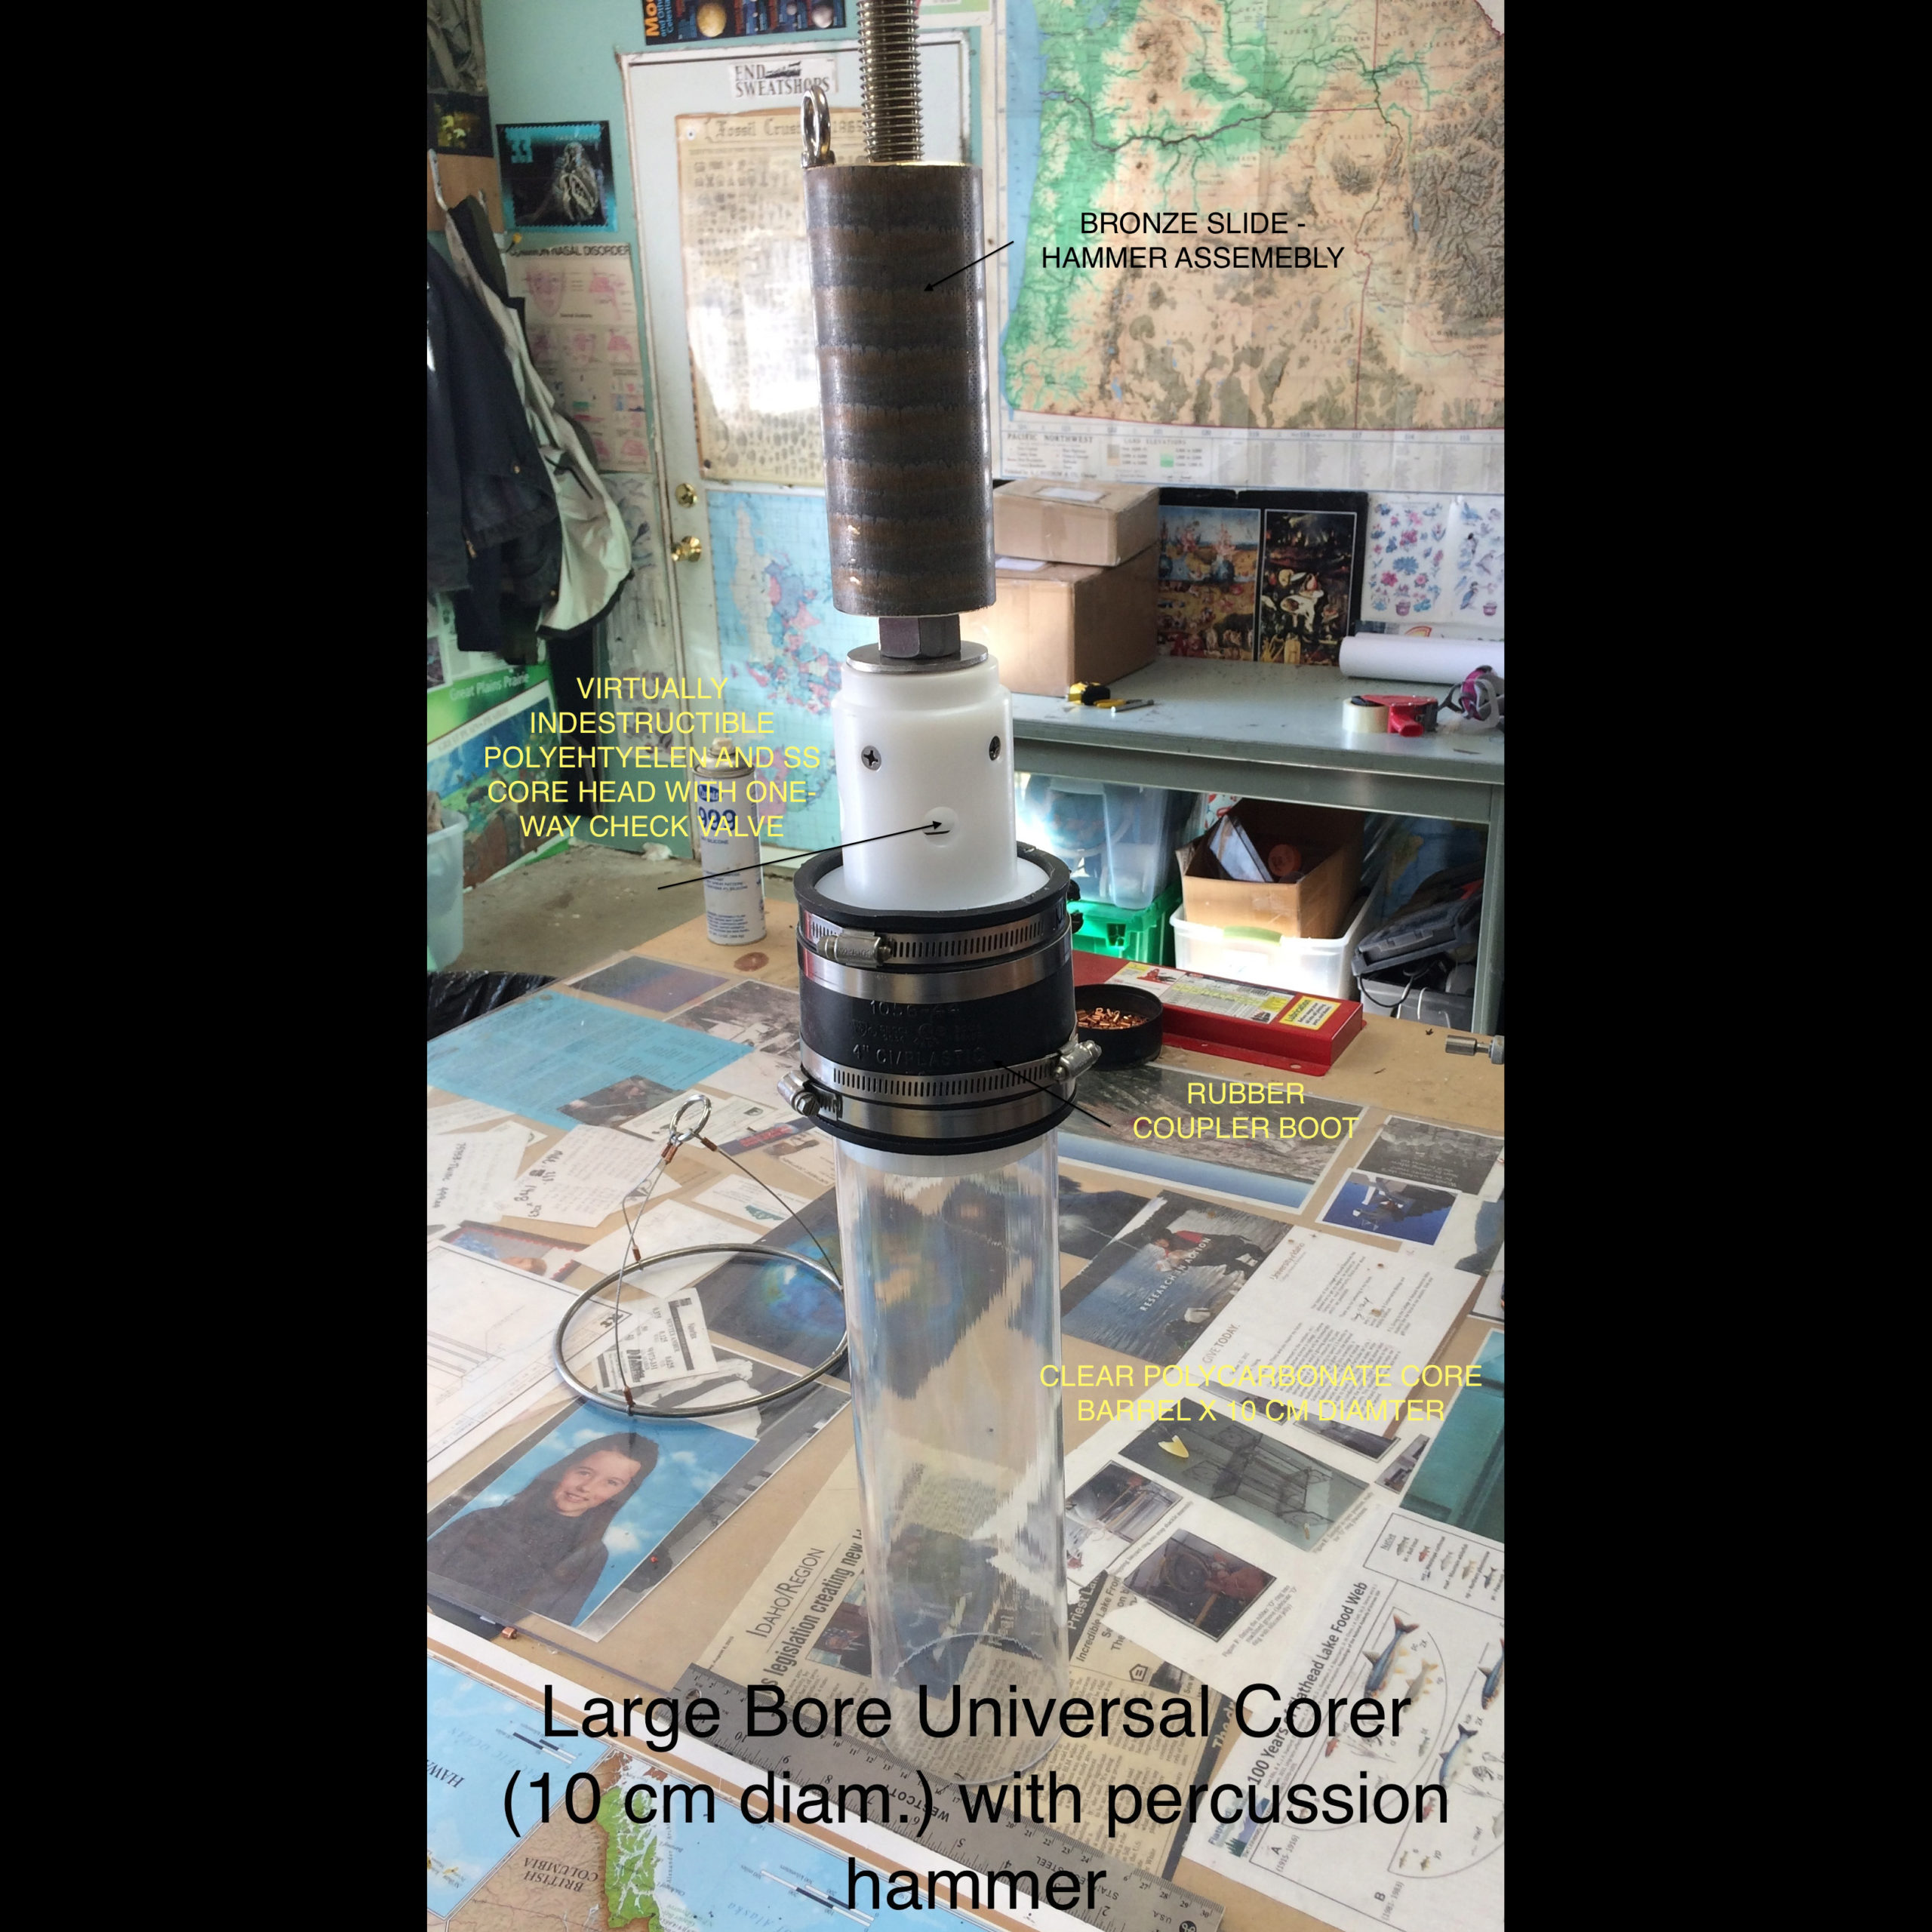 Large Bore Universal Corer